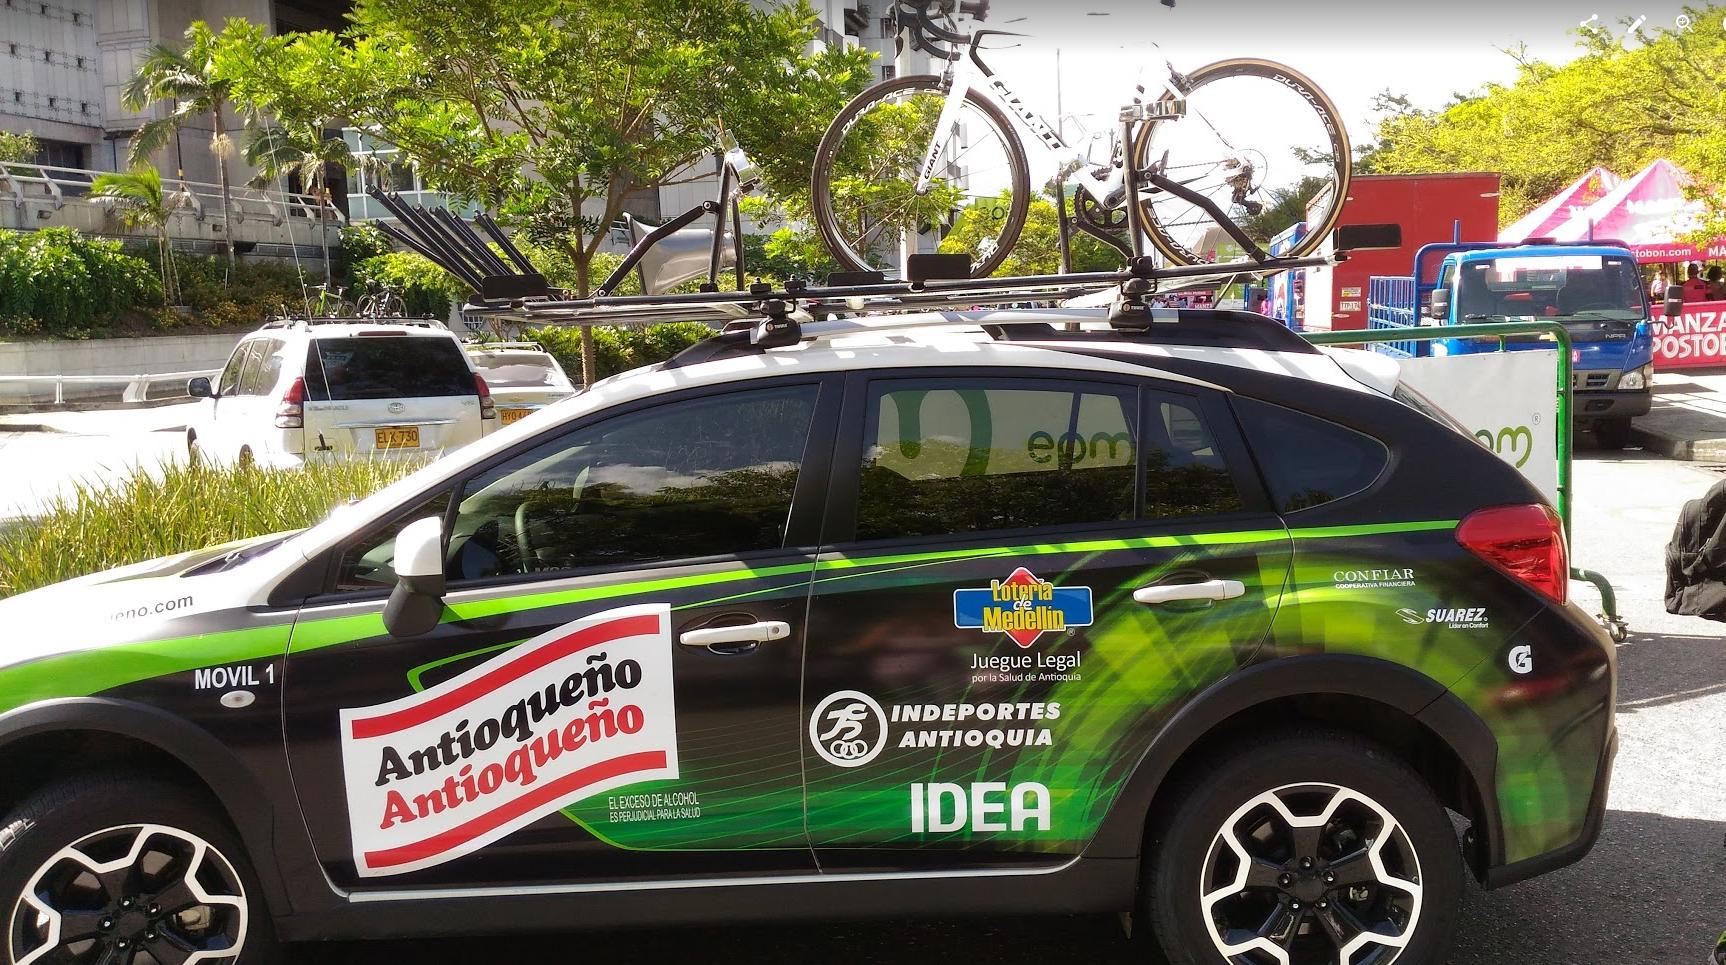 Vuelta a Colombia 2016 - Página 2 7cbb0b5be037422ca7eda4efe1eccb23